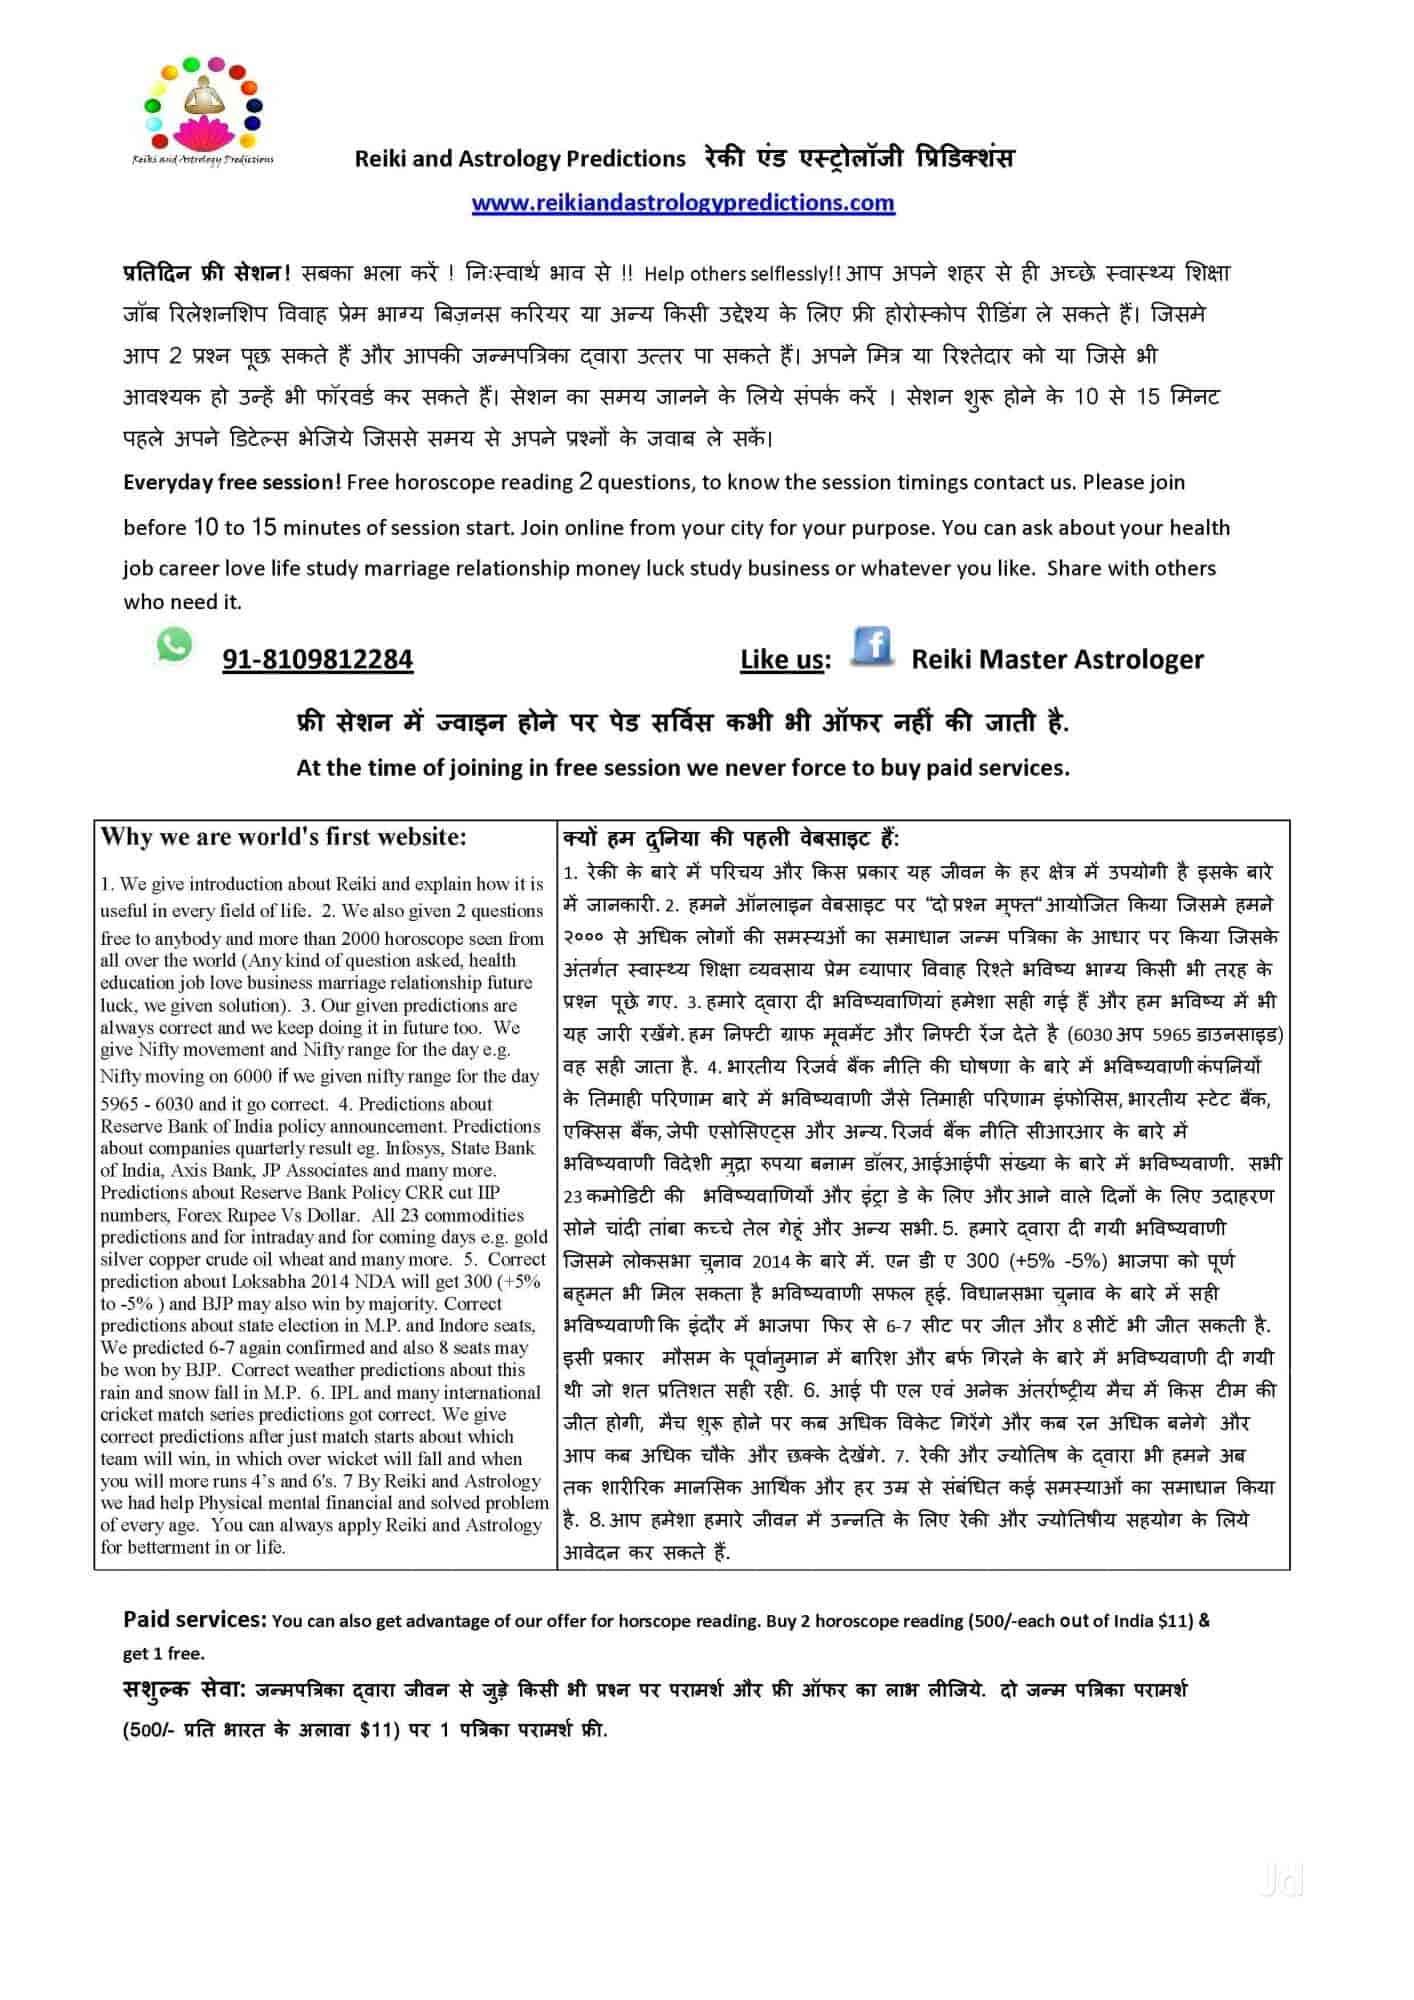 Reiki and Astrology Predictions, Vijay Nagar - Reiki Healing Centres